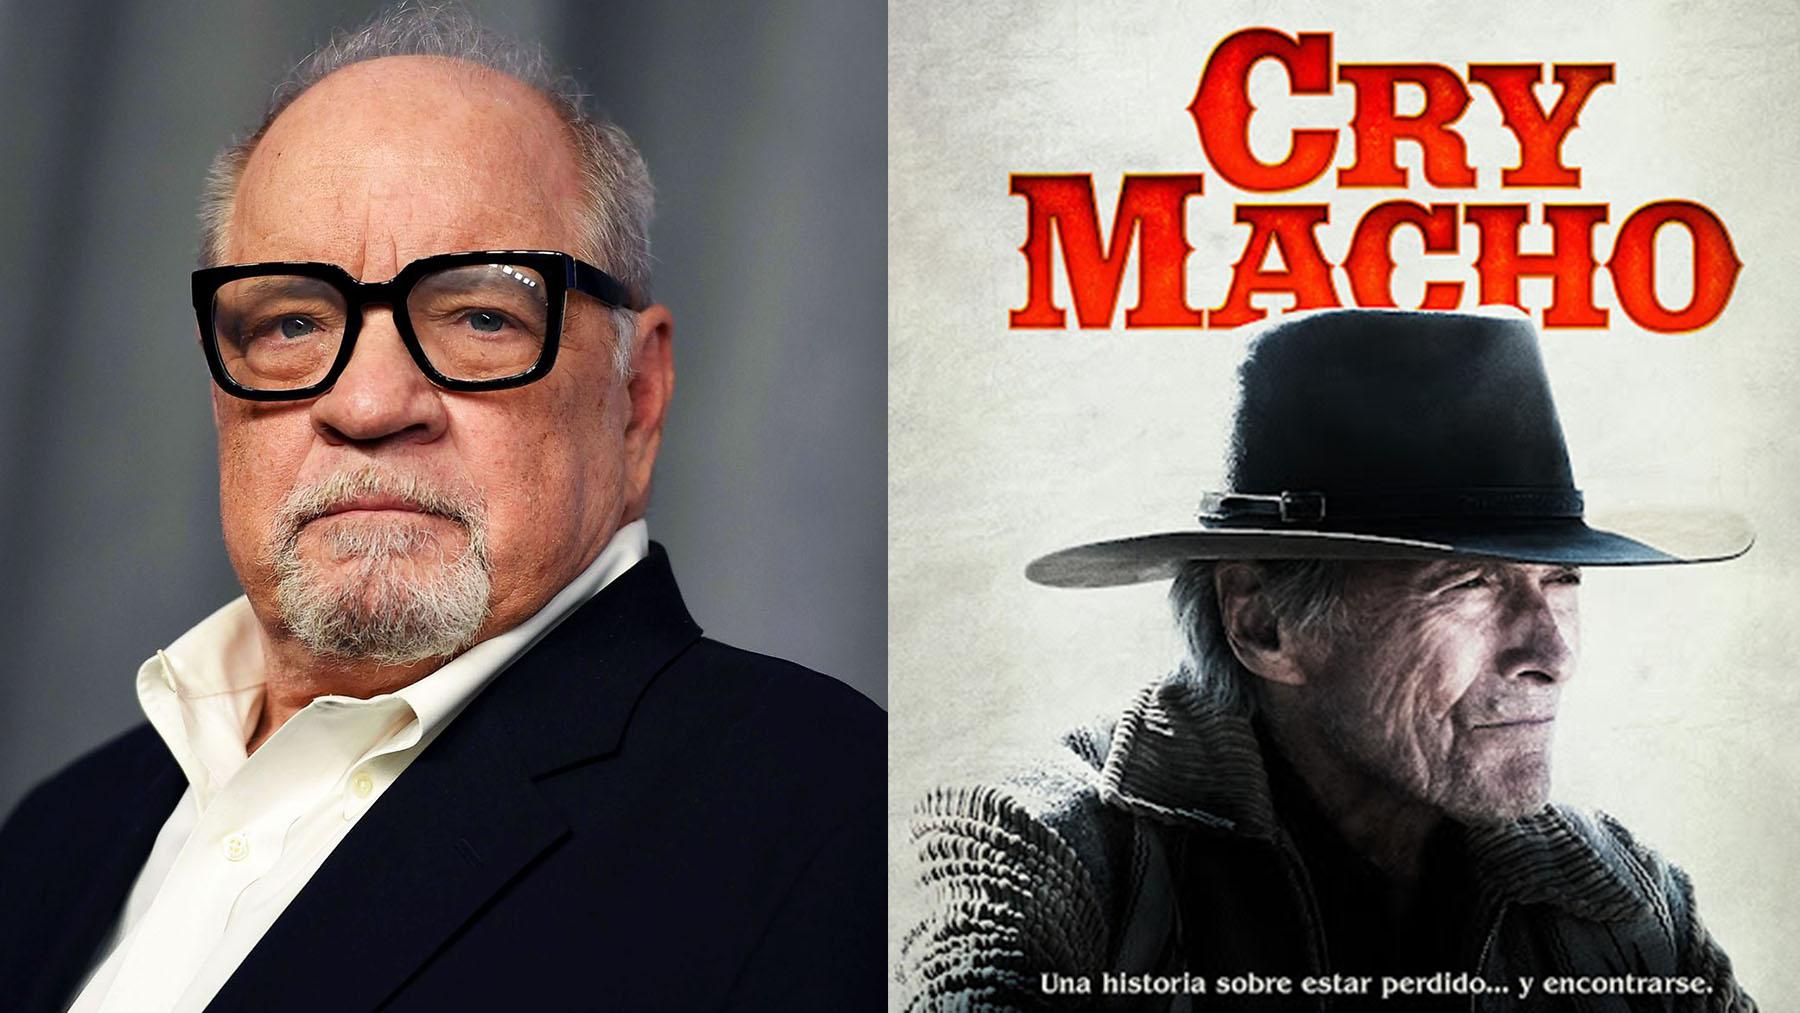 Al guionista Paul Schrader no le ha gustado nada «Cry Macho», la última película de Clint Eastwood